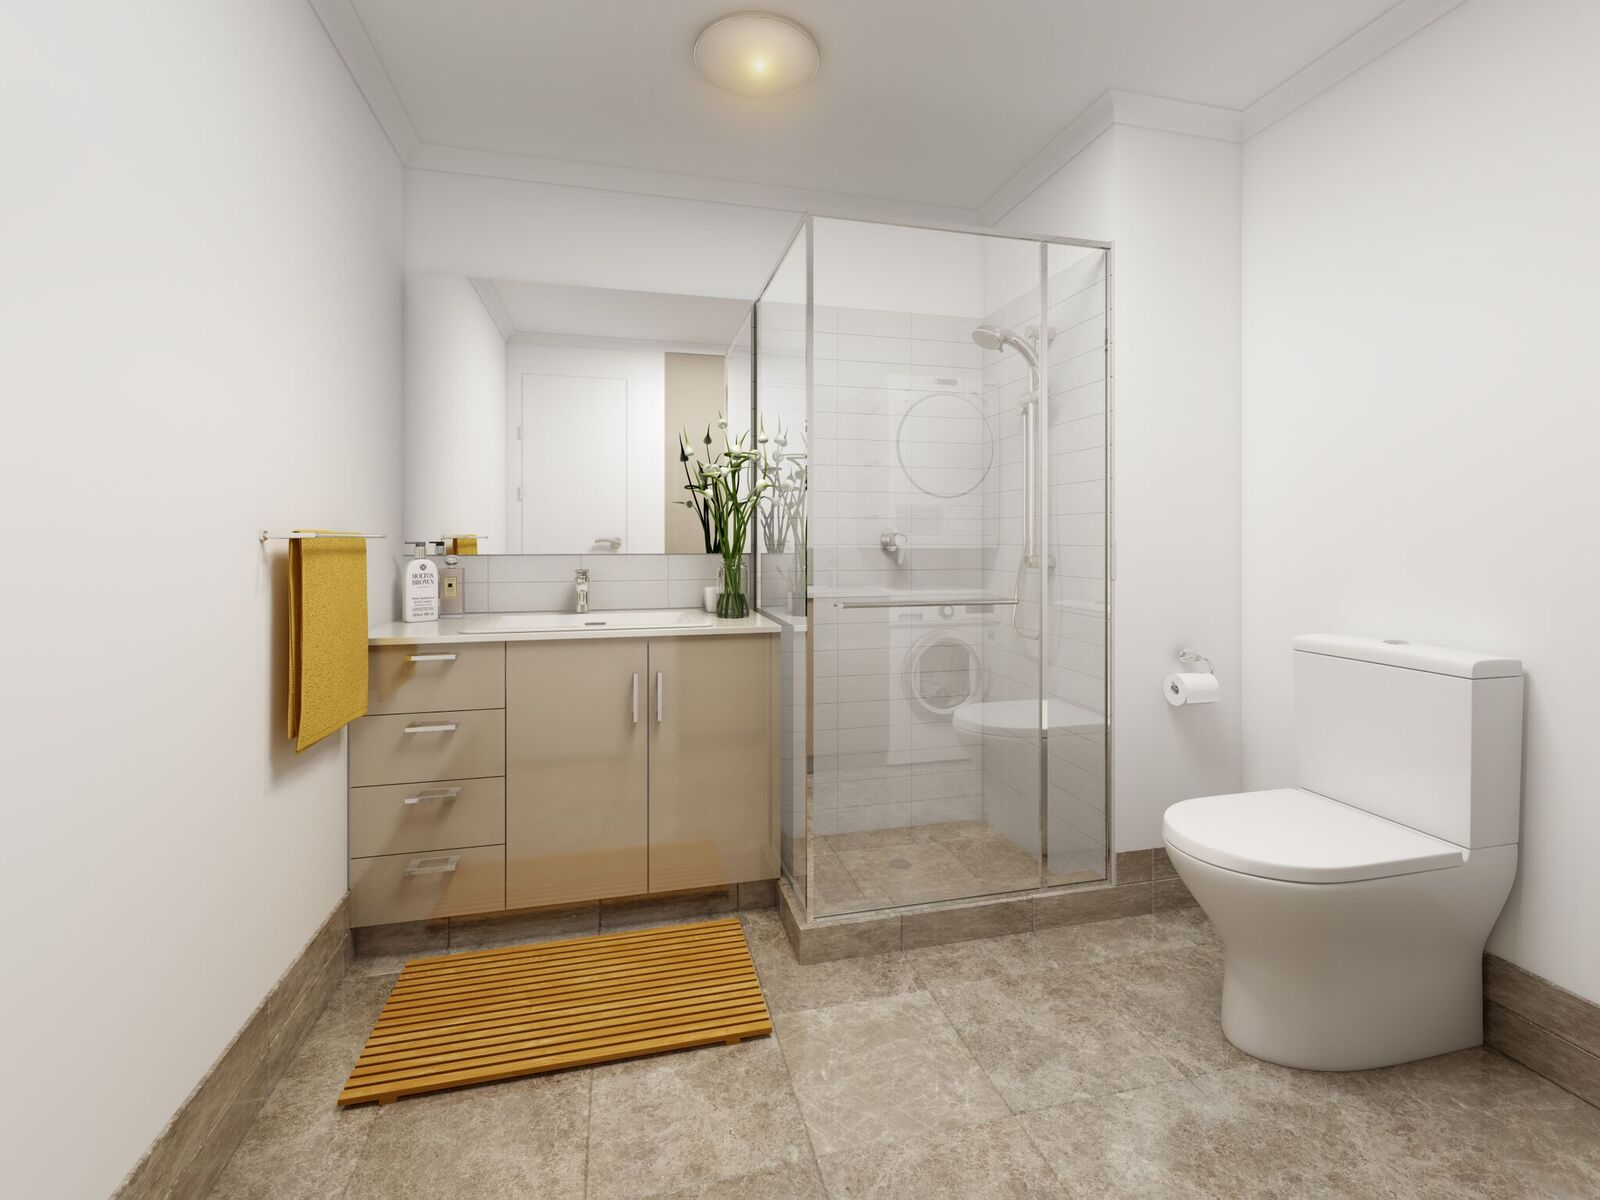 Bathroom Cockburn.jpg